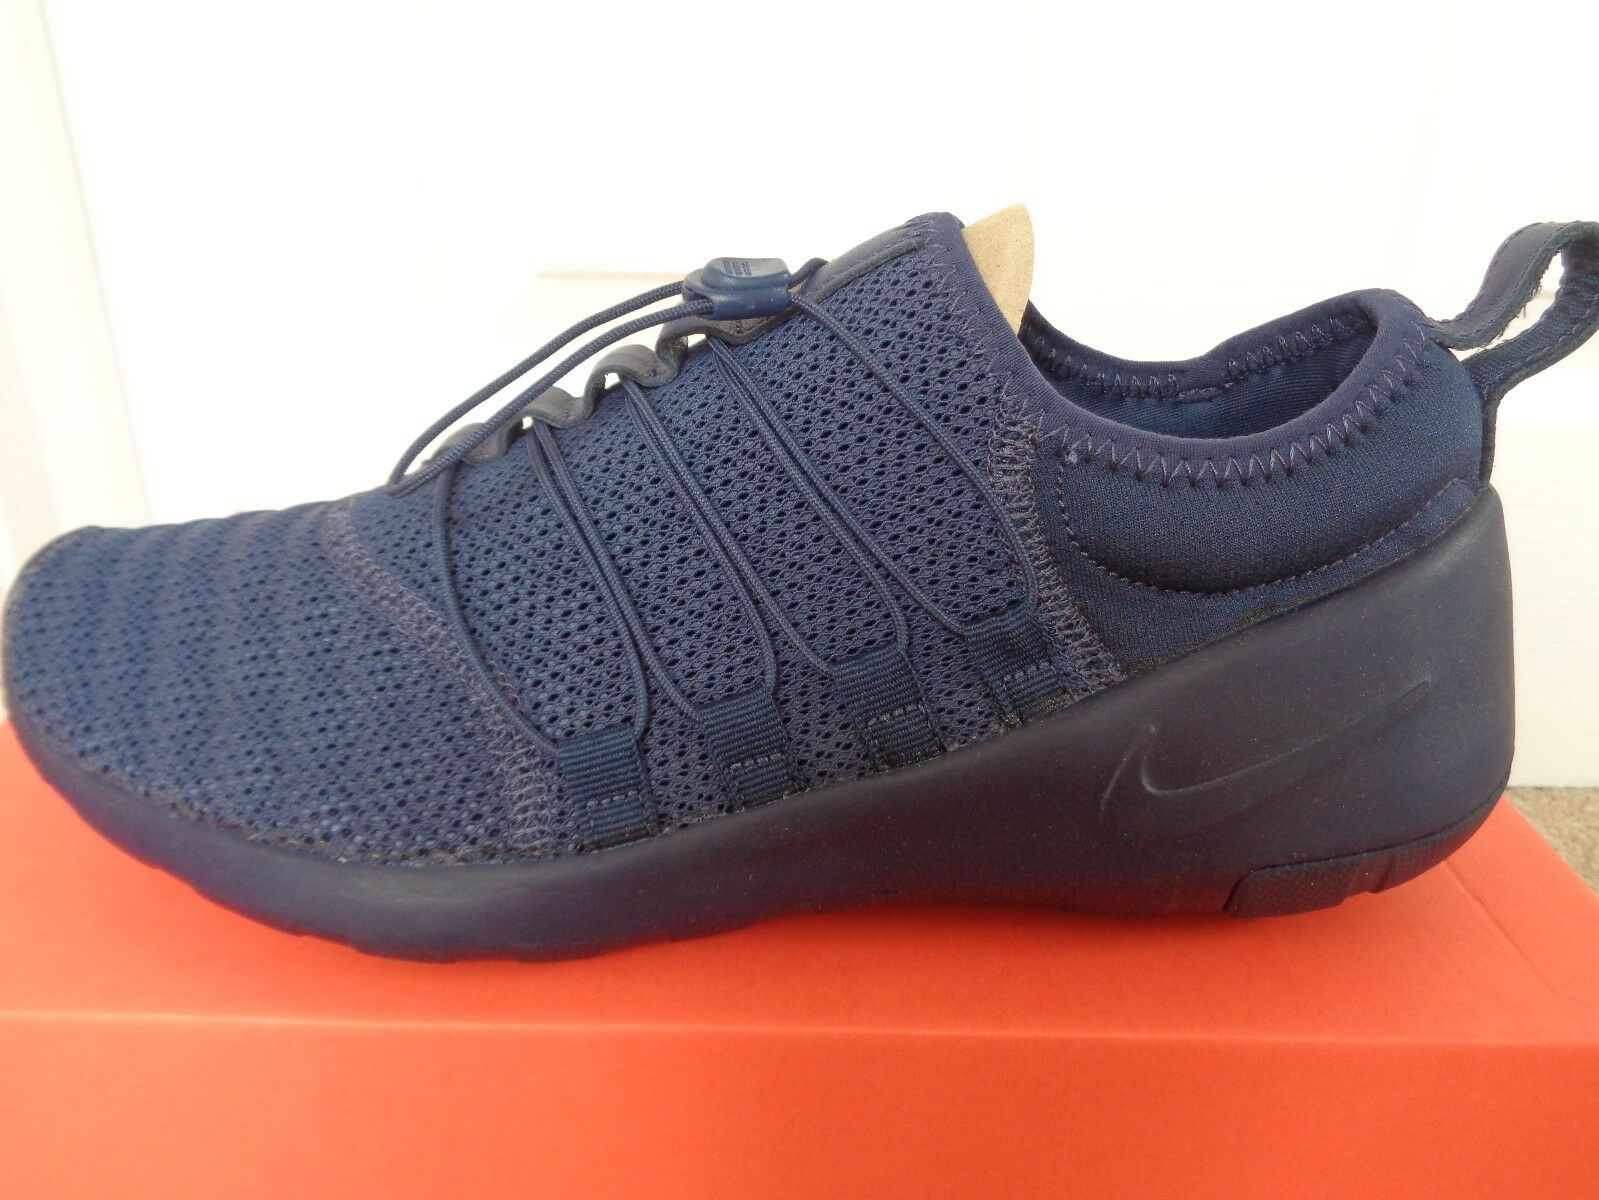 Nike Payaa Prem QS mens trainers shoes 819803 444 eu 42.5 us 9 NEW+BOX